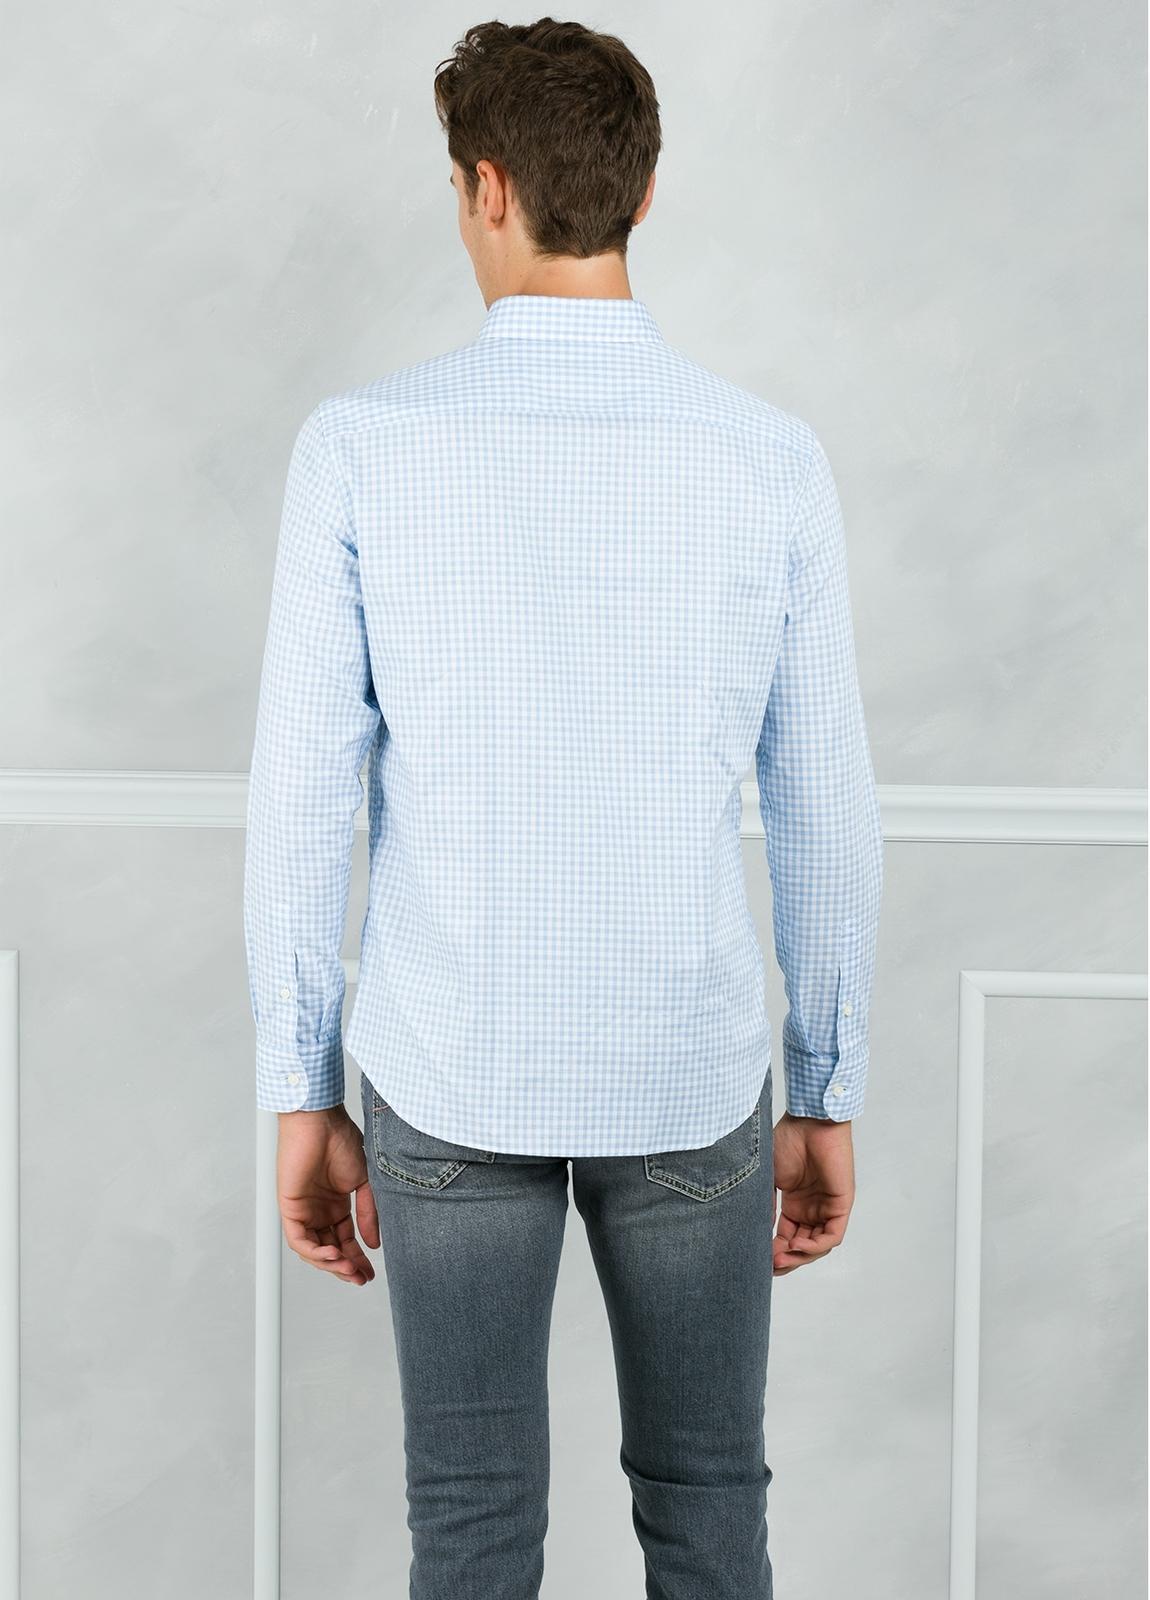 Camisa Leisure Wear REGULAR FIT Modelo BOTTON DOWN cuadro vichy color celeste. 100% Algodón. - Ítem2